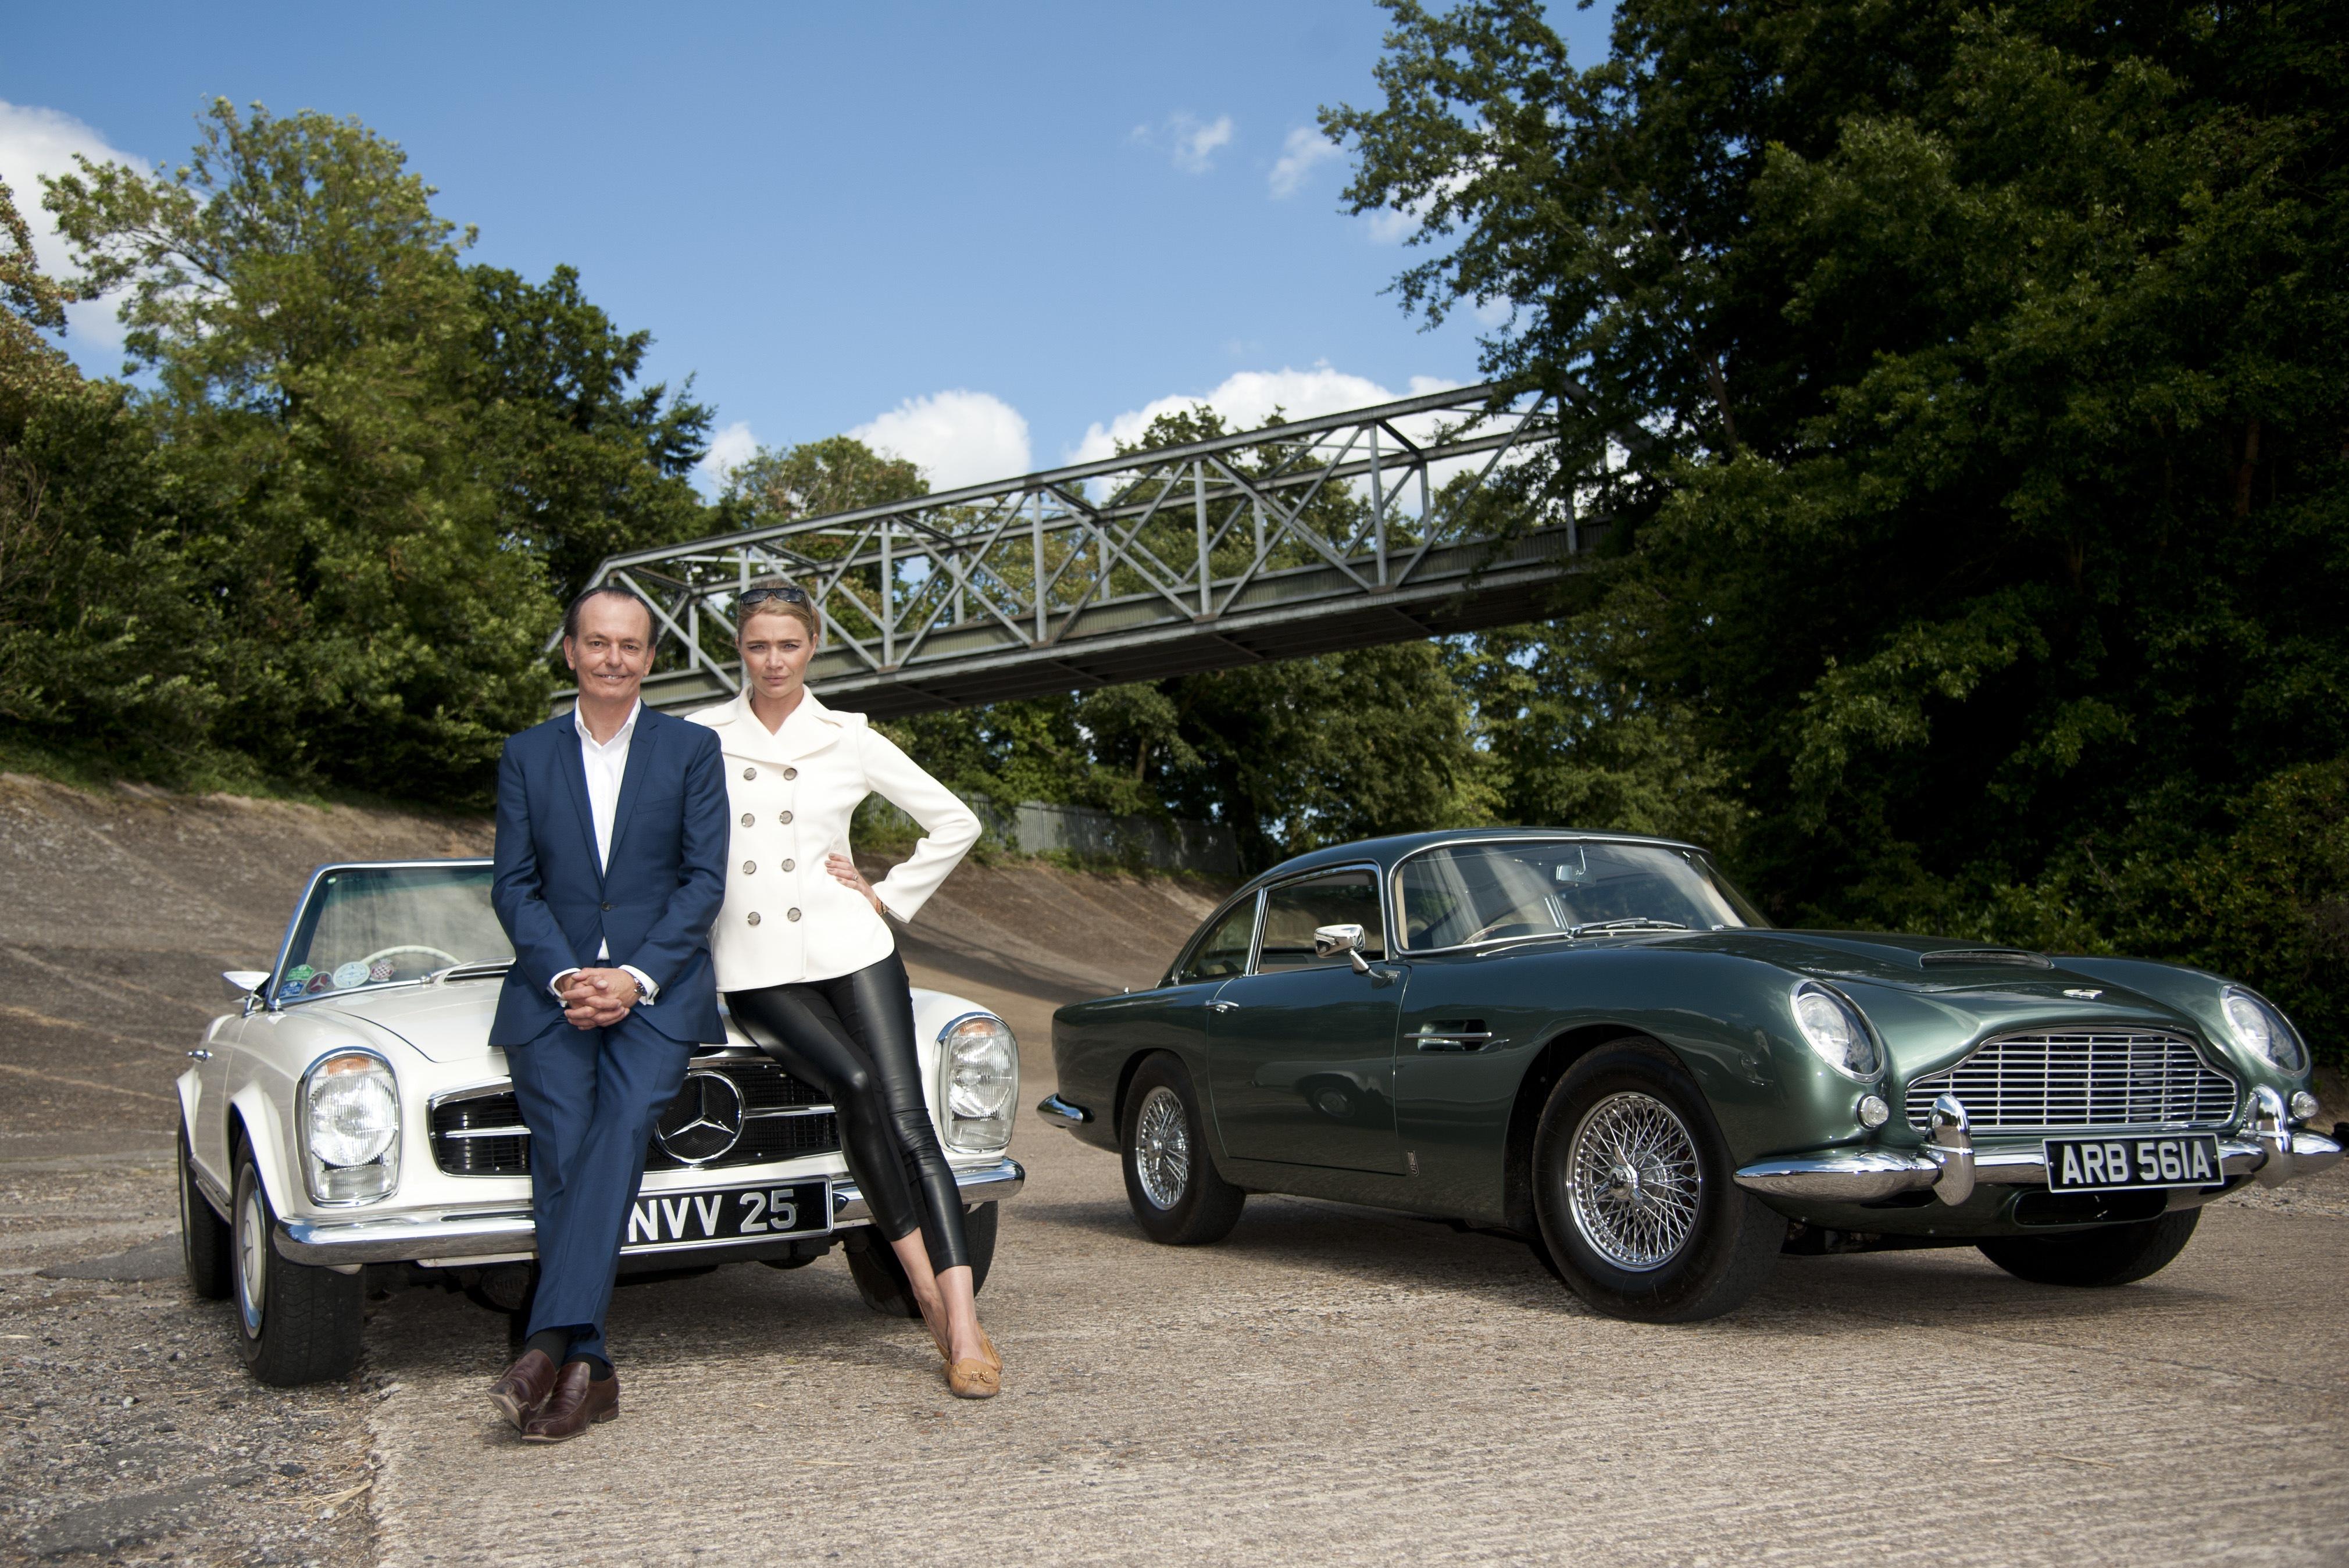 New TV show 'The Classic Car Show' starts this Thursday - Mōtā Car Blog